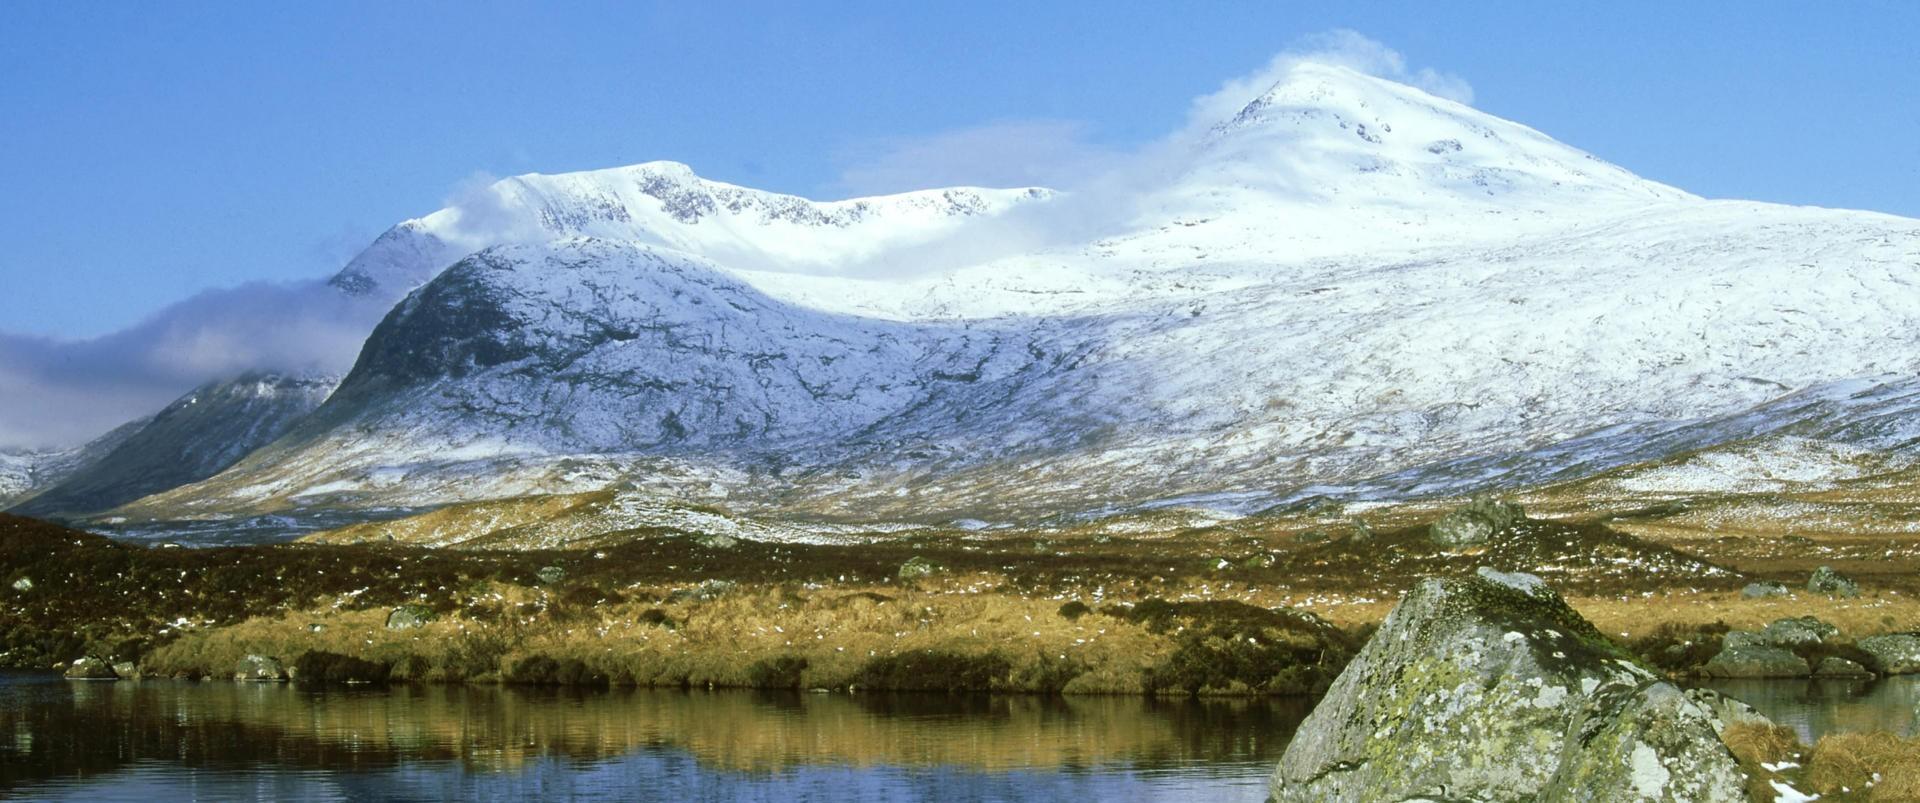 scotland-highlands5-2.jpg